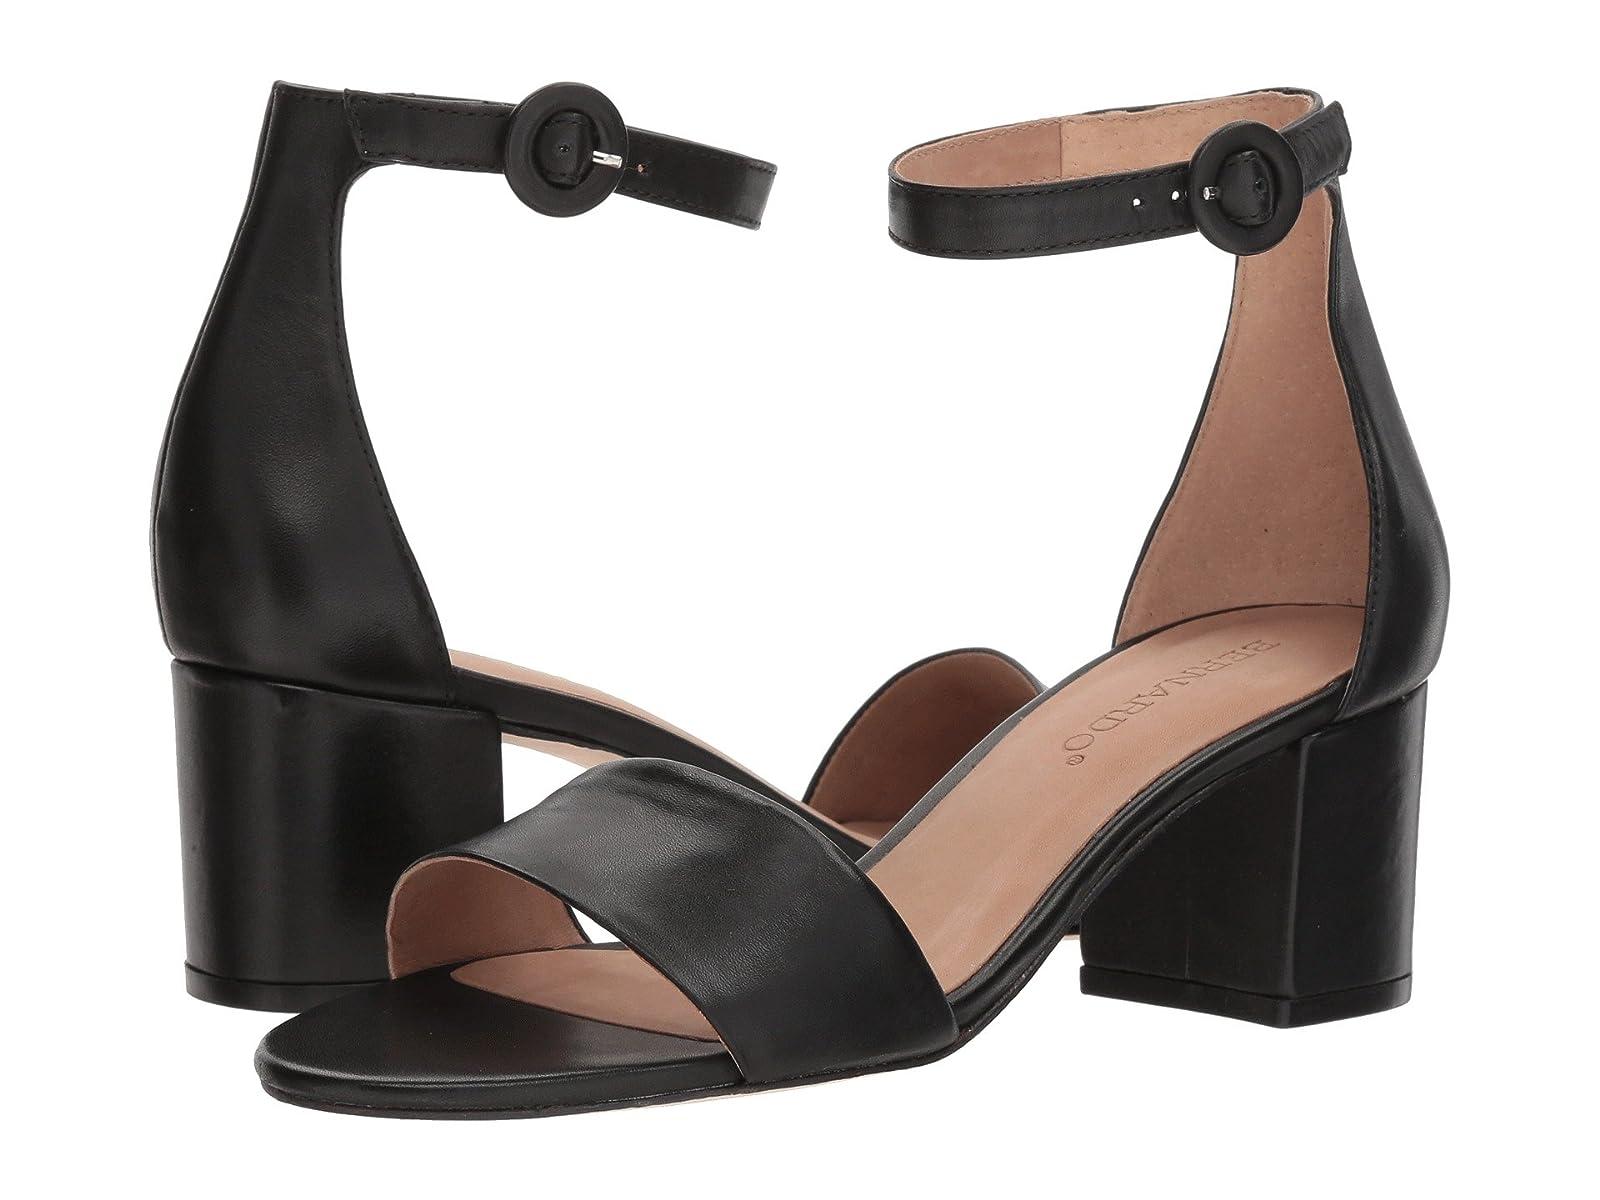 Bernardo BelindaAtmospheric grades have affordable shoes